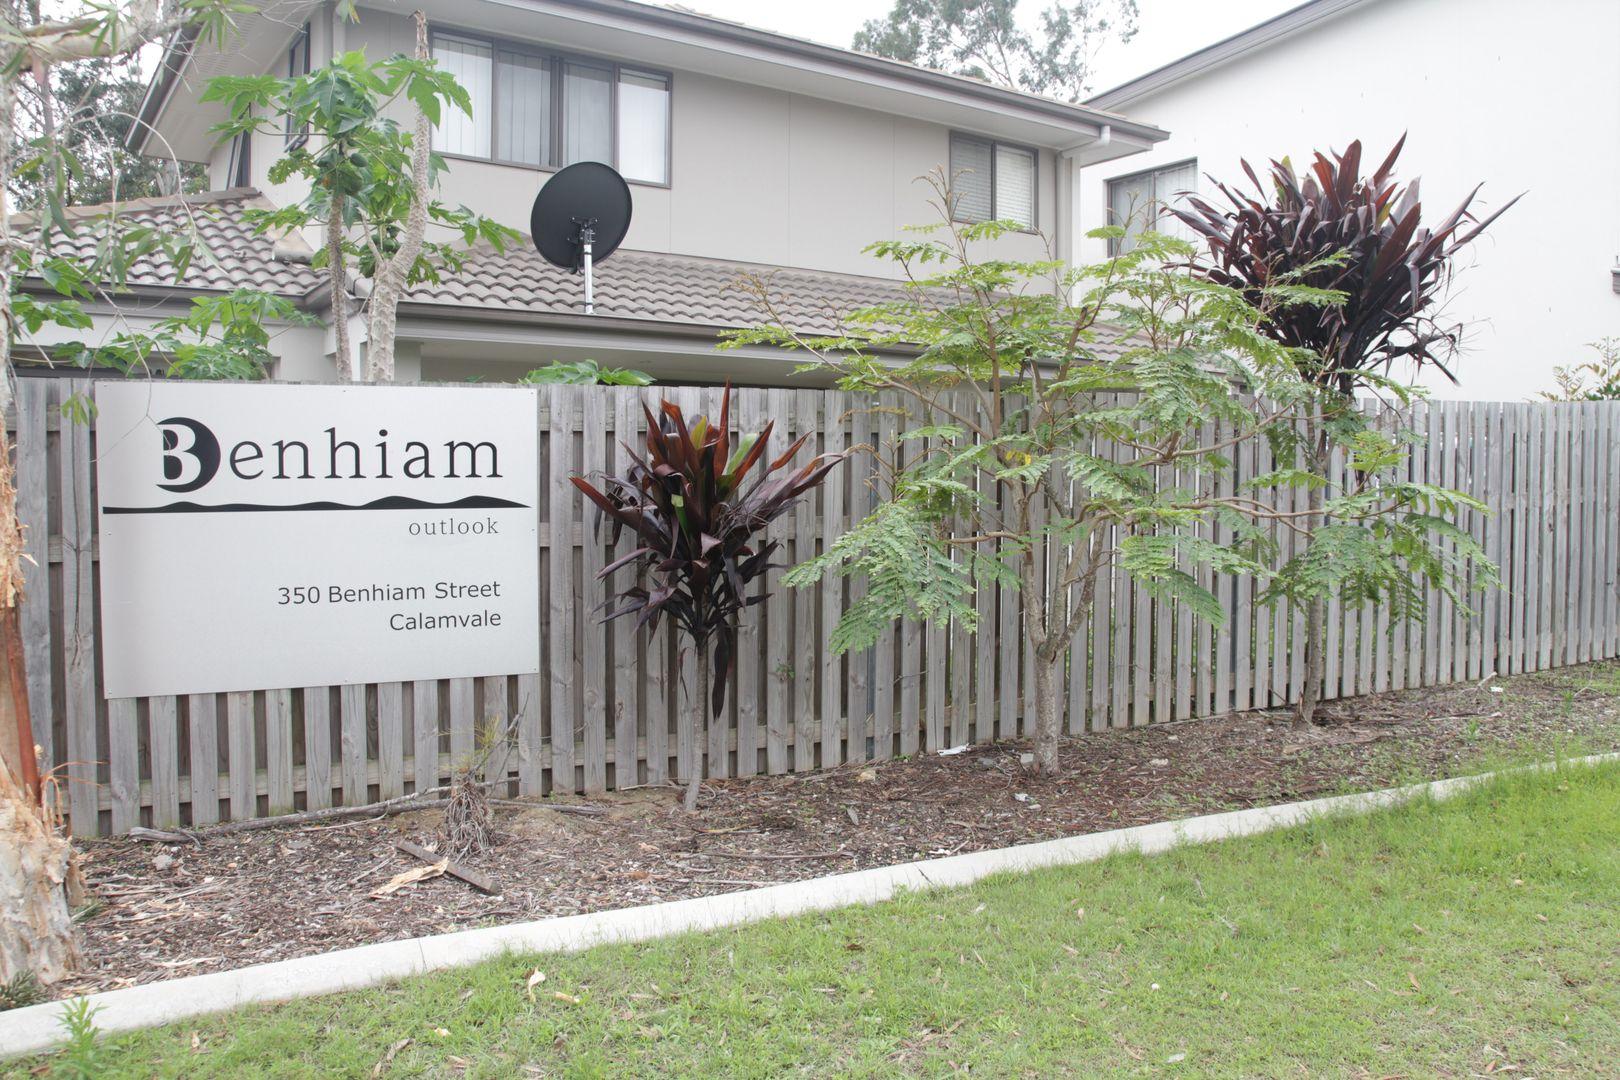 350 BENHIAM STREET, Calamvale QLD 4116, Image 0